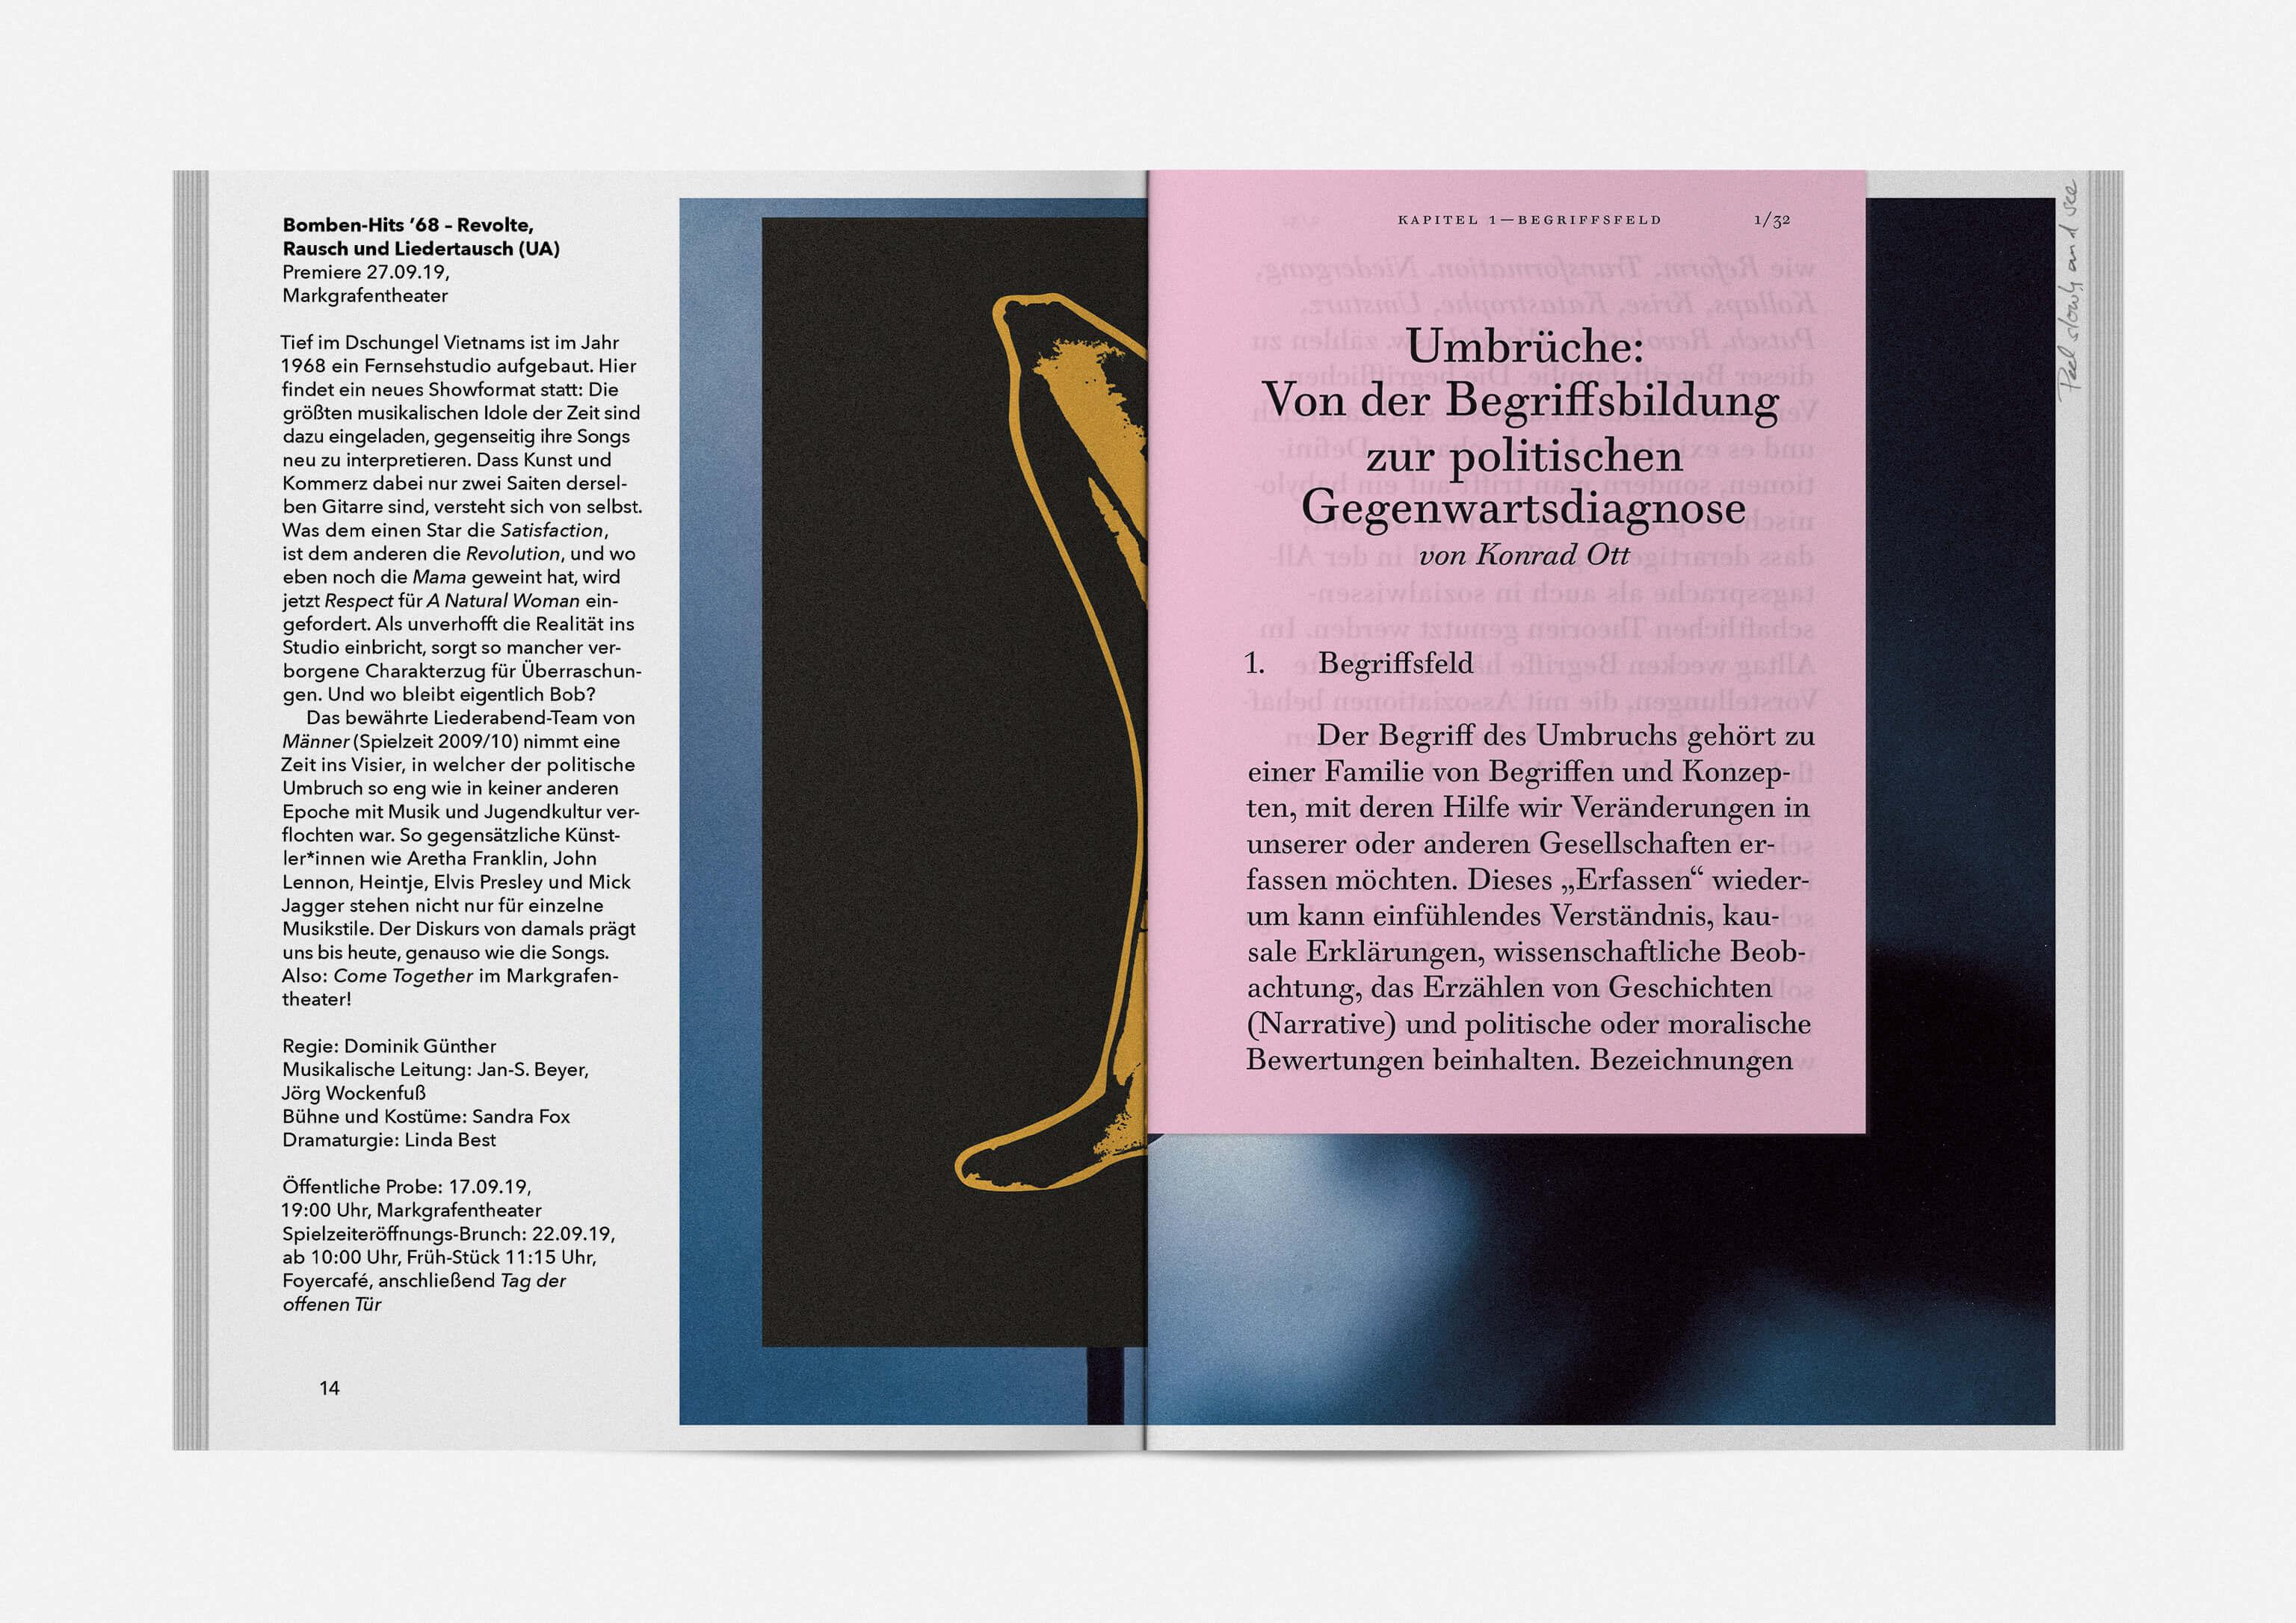 https://neuegestaltung.de/media/pages/clients/theater-erlangen-season-program-19-20/168941173b-1597415337/te_szh_19_20_innenseite_14_15_a_ng.jpg